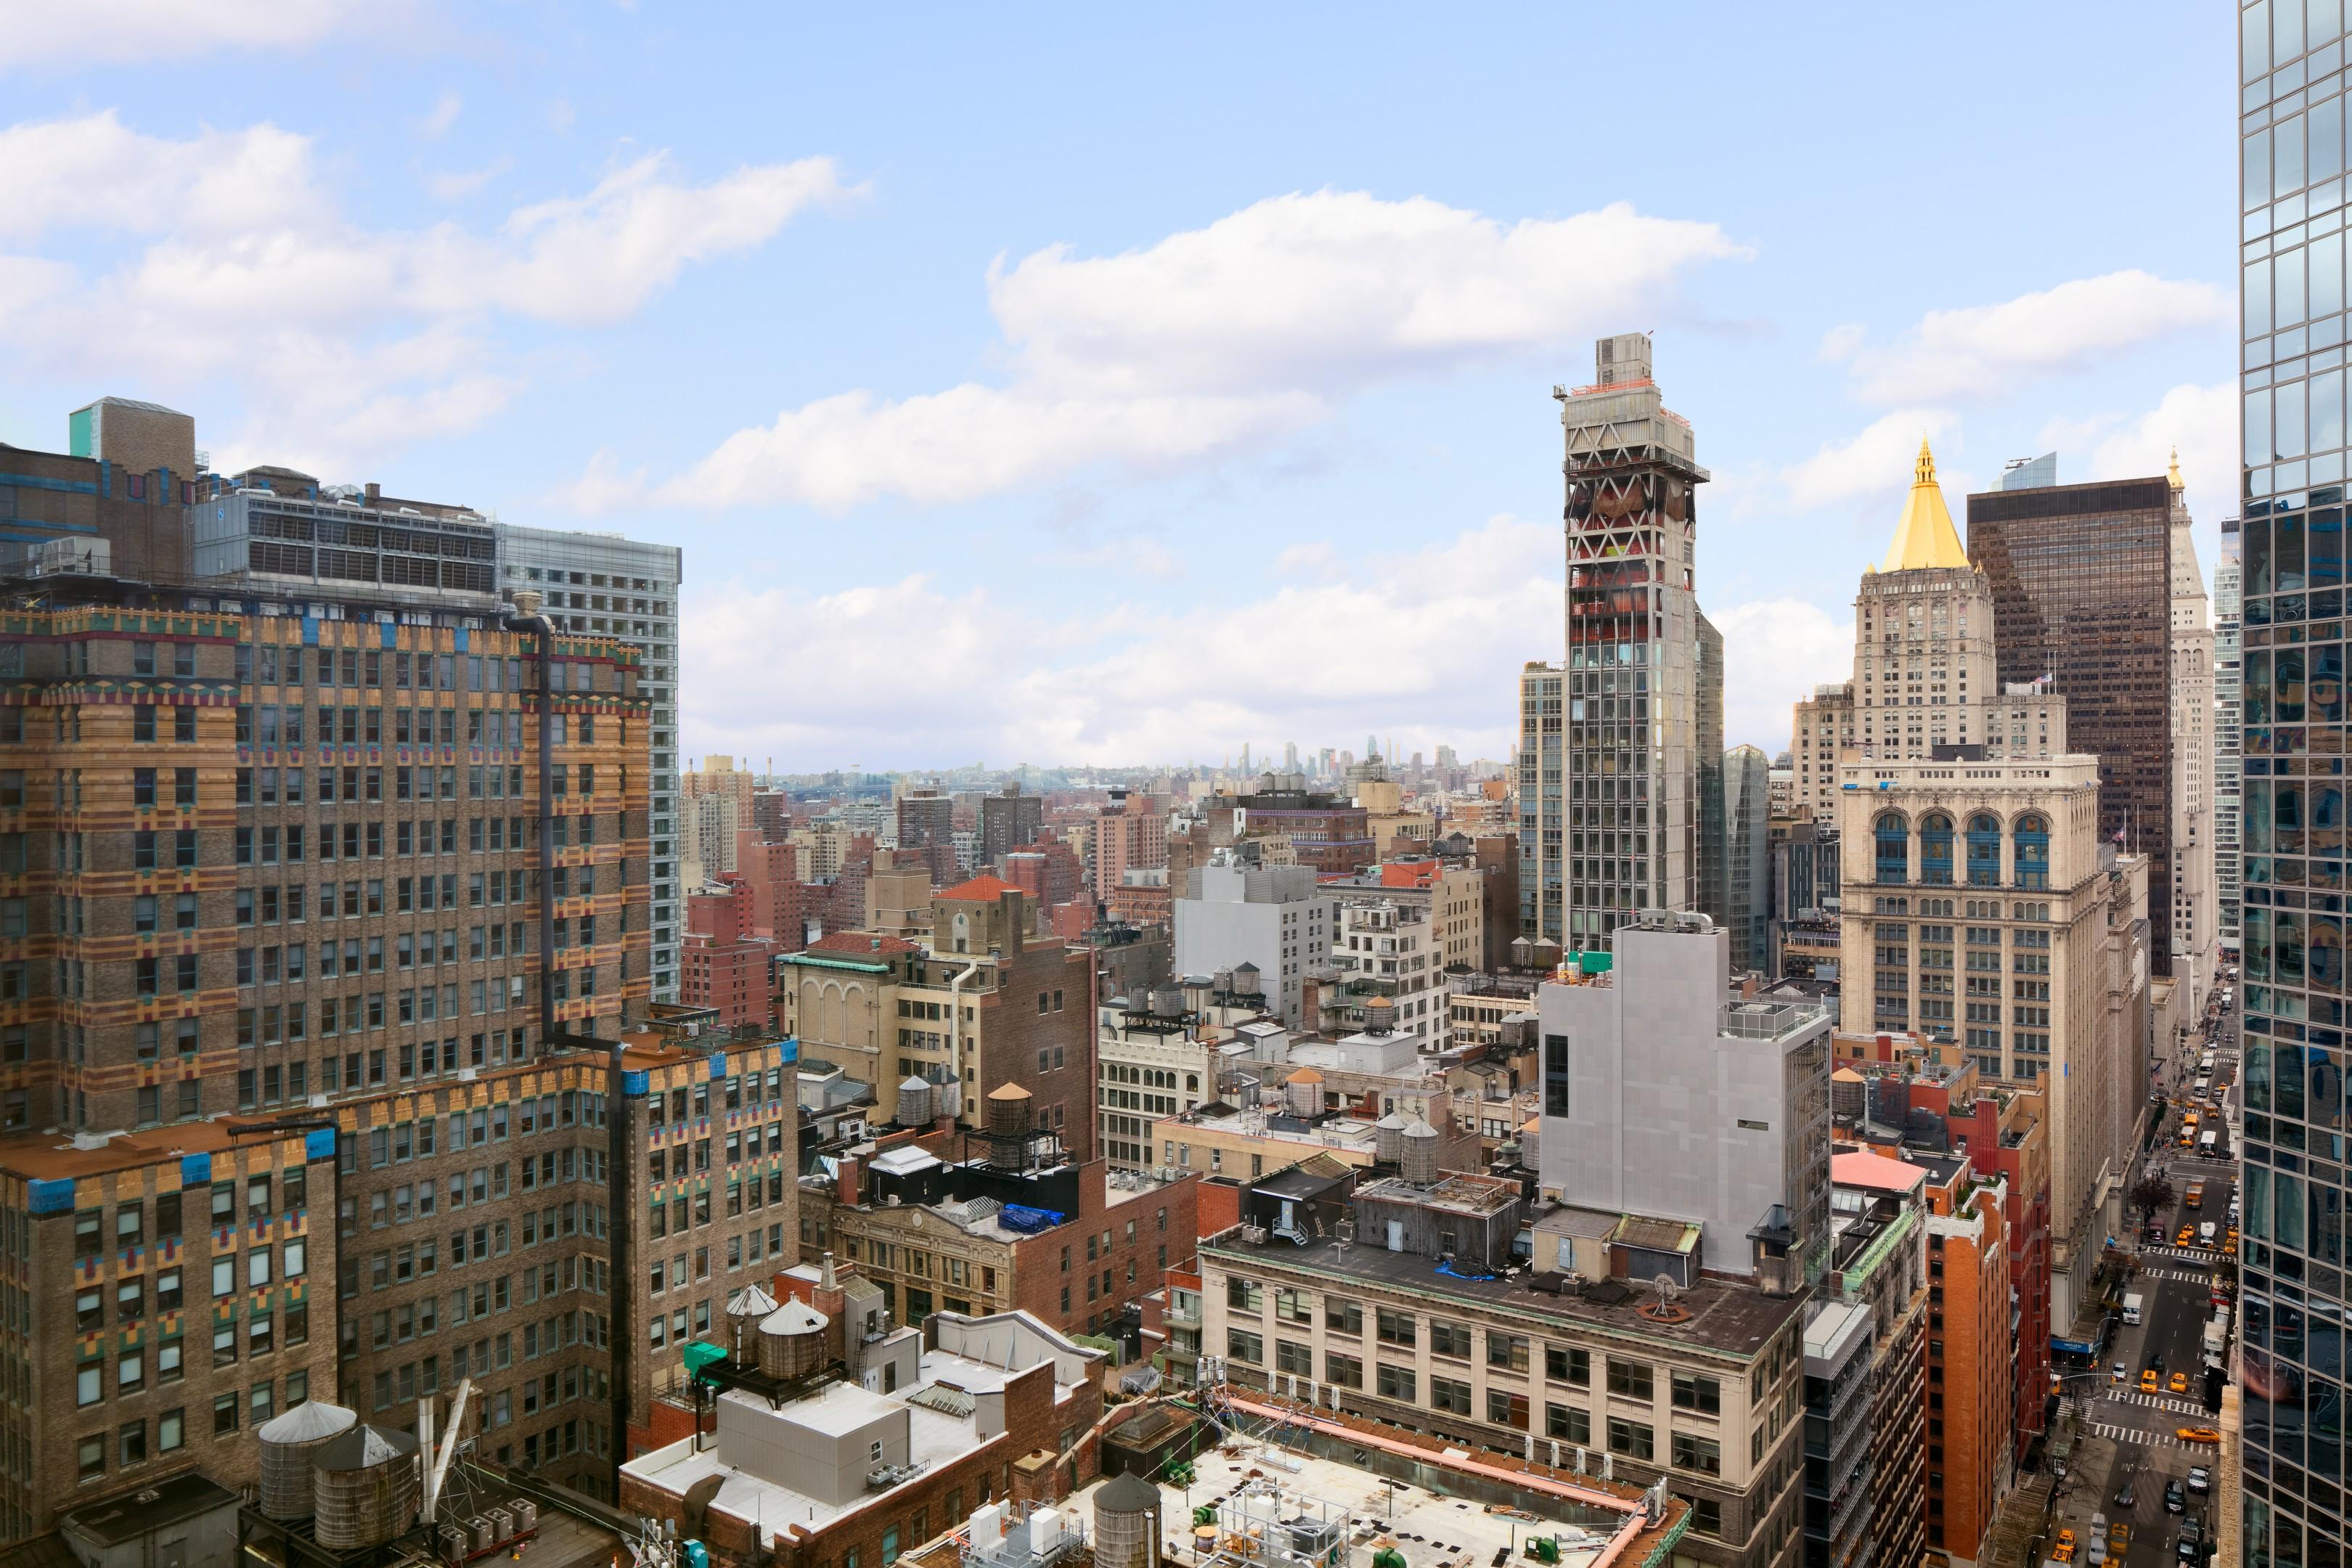 Covet New York Enter The Coveted World Of Covet New York! Enter The Coveted World Of Covet New York 1